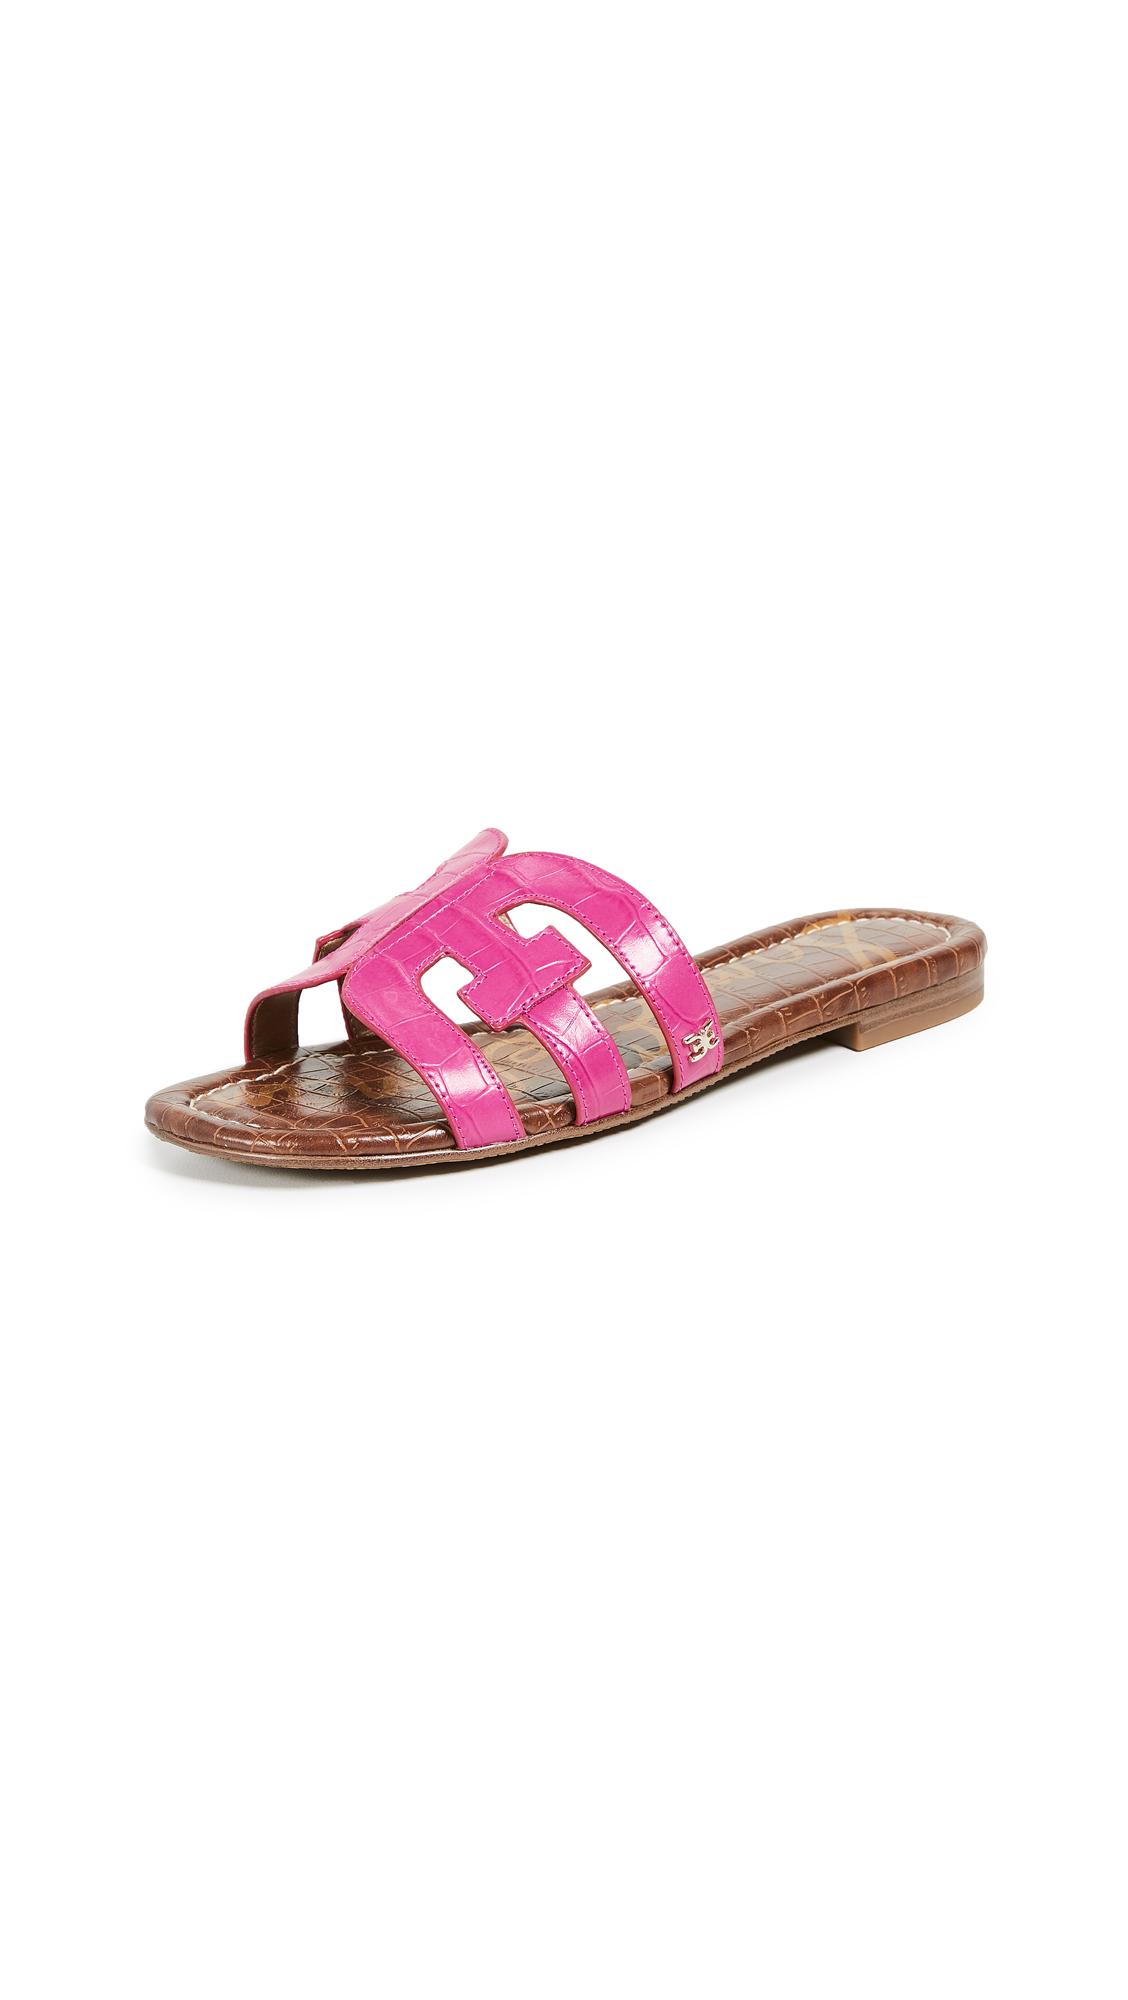 Sam Edelman Bay Slides - Pink Peony